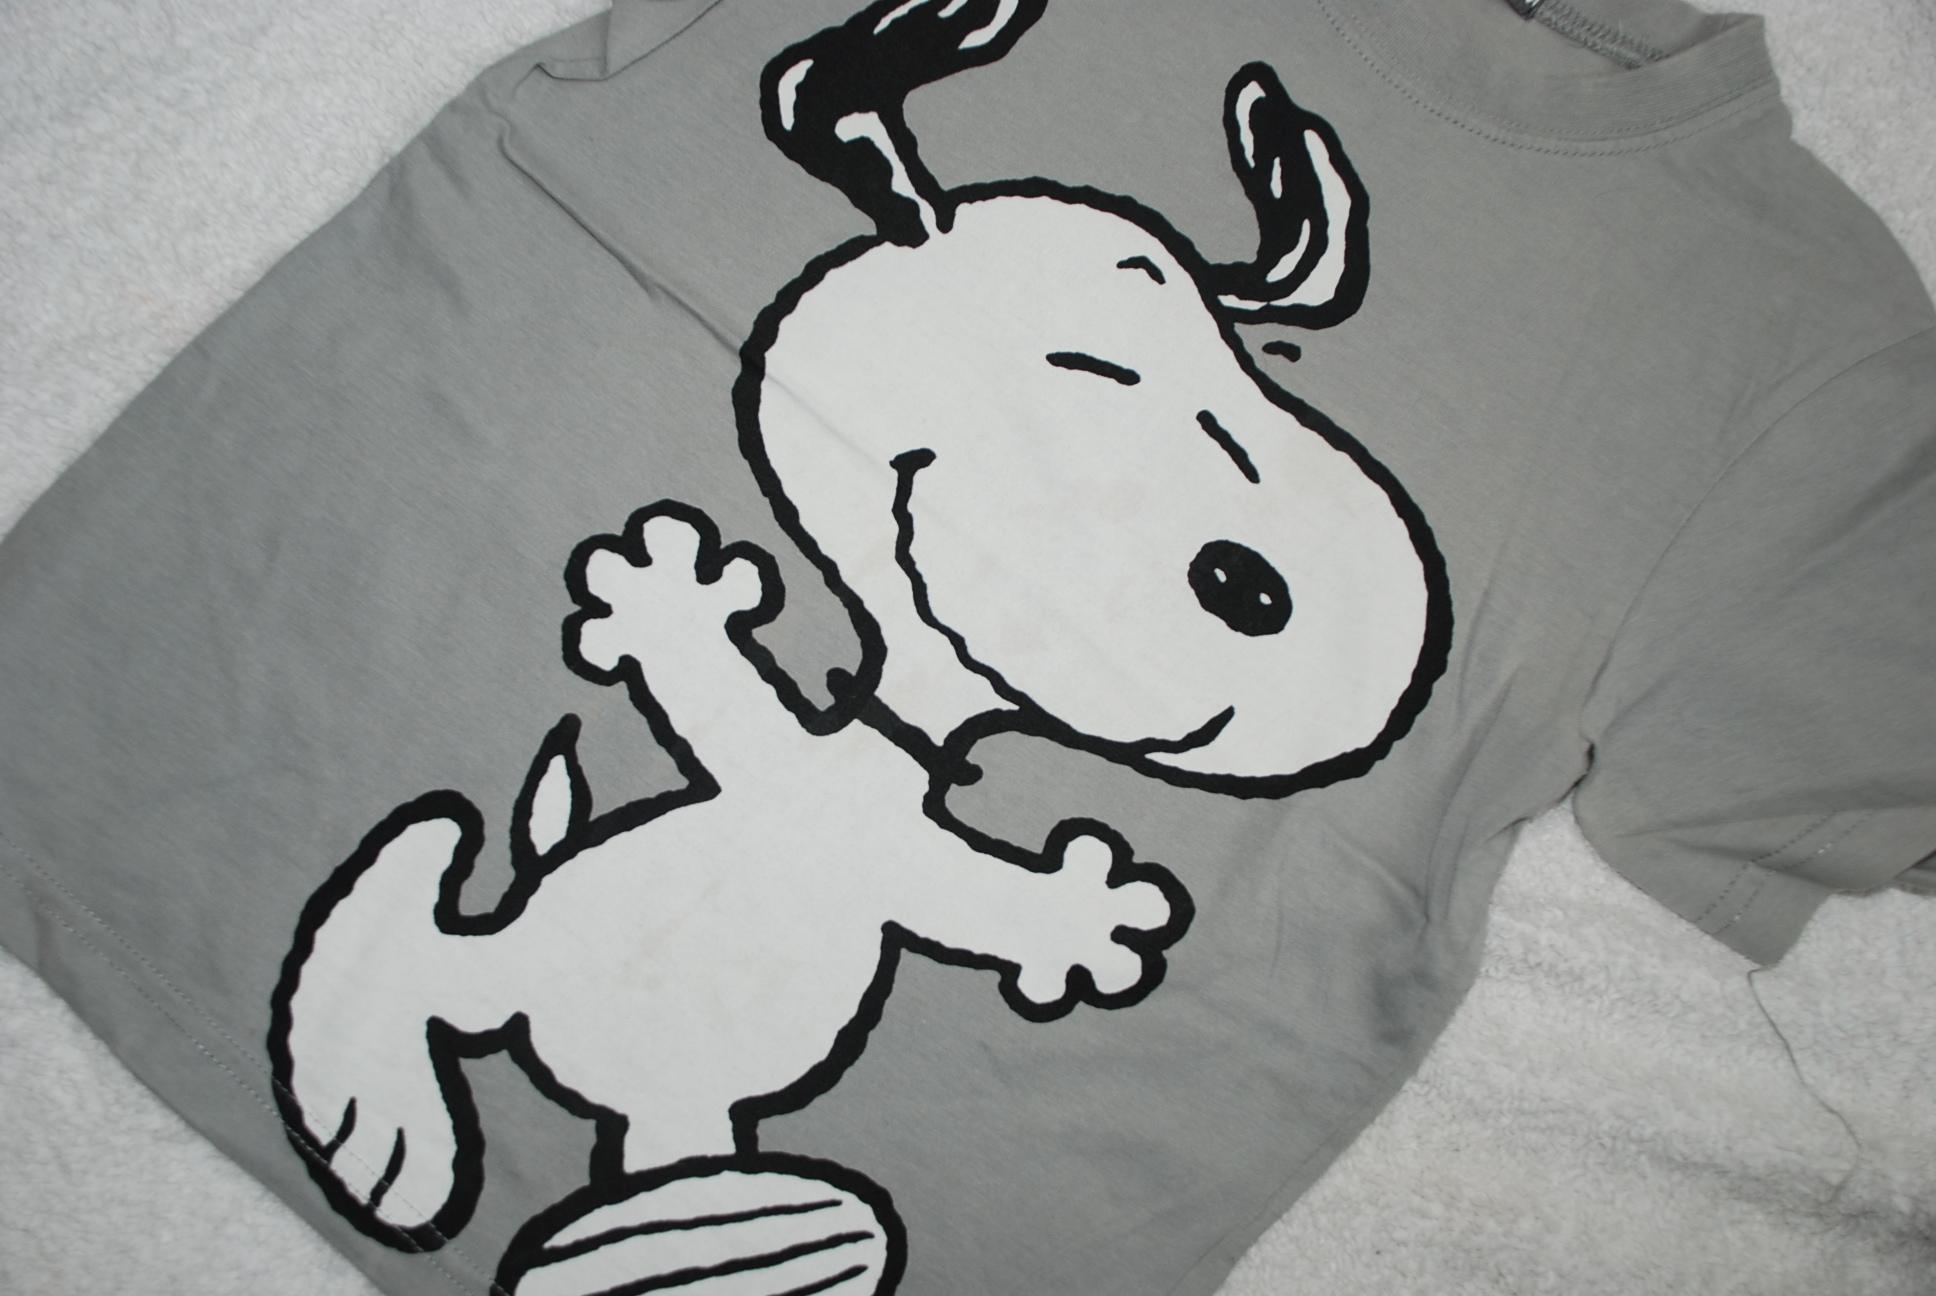 Snoopy Archiwum 116 amp;m T H Ekstra Allegro Shirt Oficjalne 7315824977 QrtBsdCxh